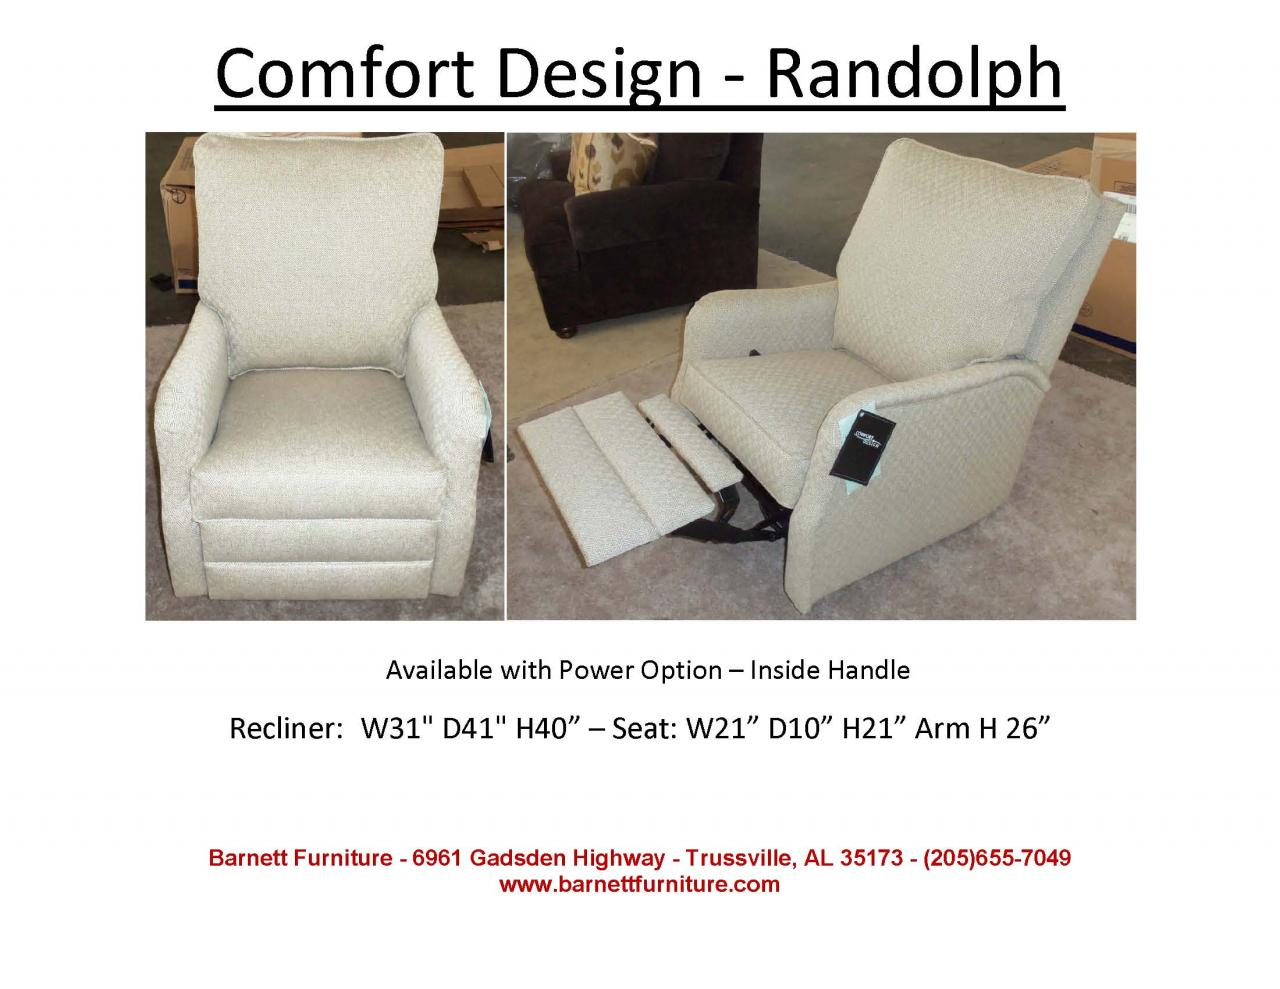 Comfort Design Randolph Swivel Glider Recliner